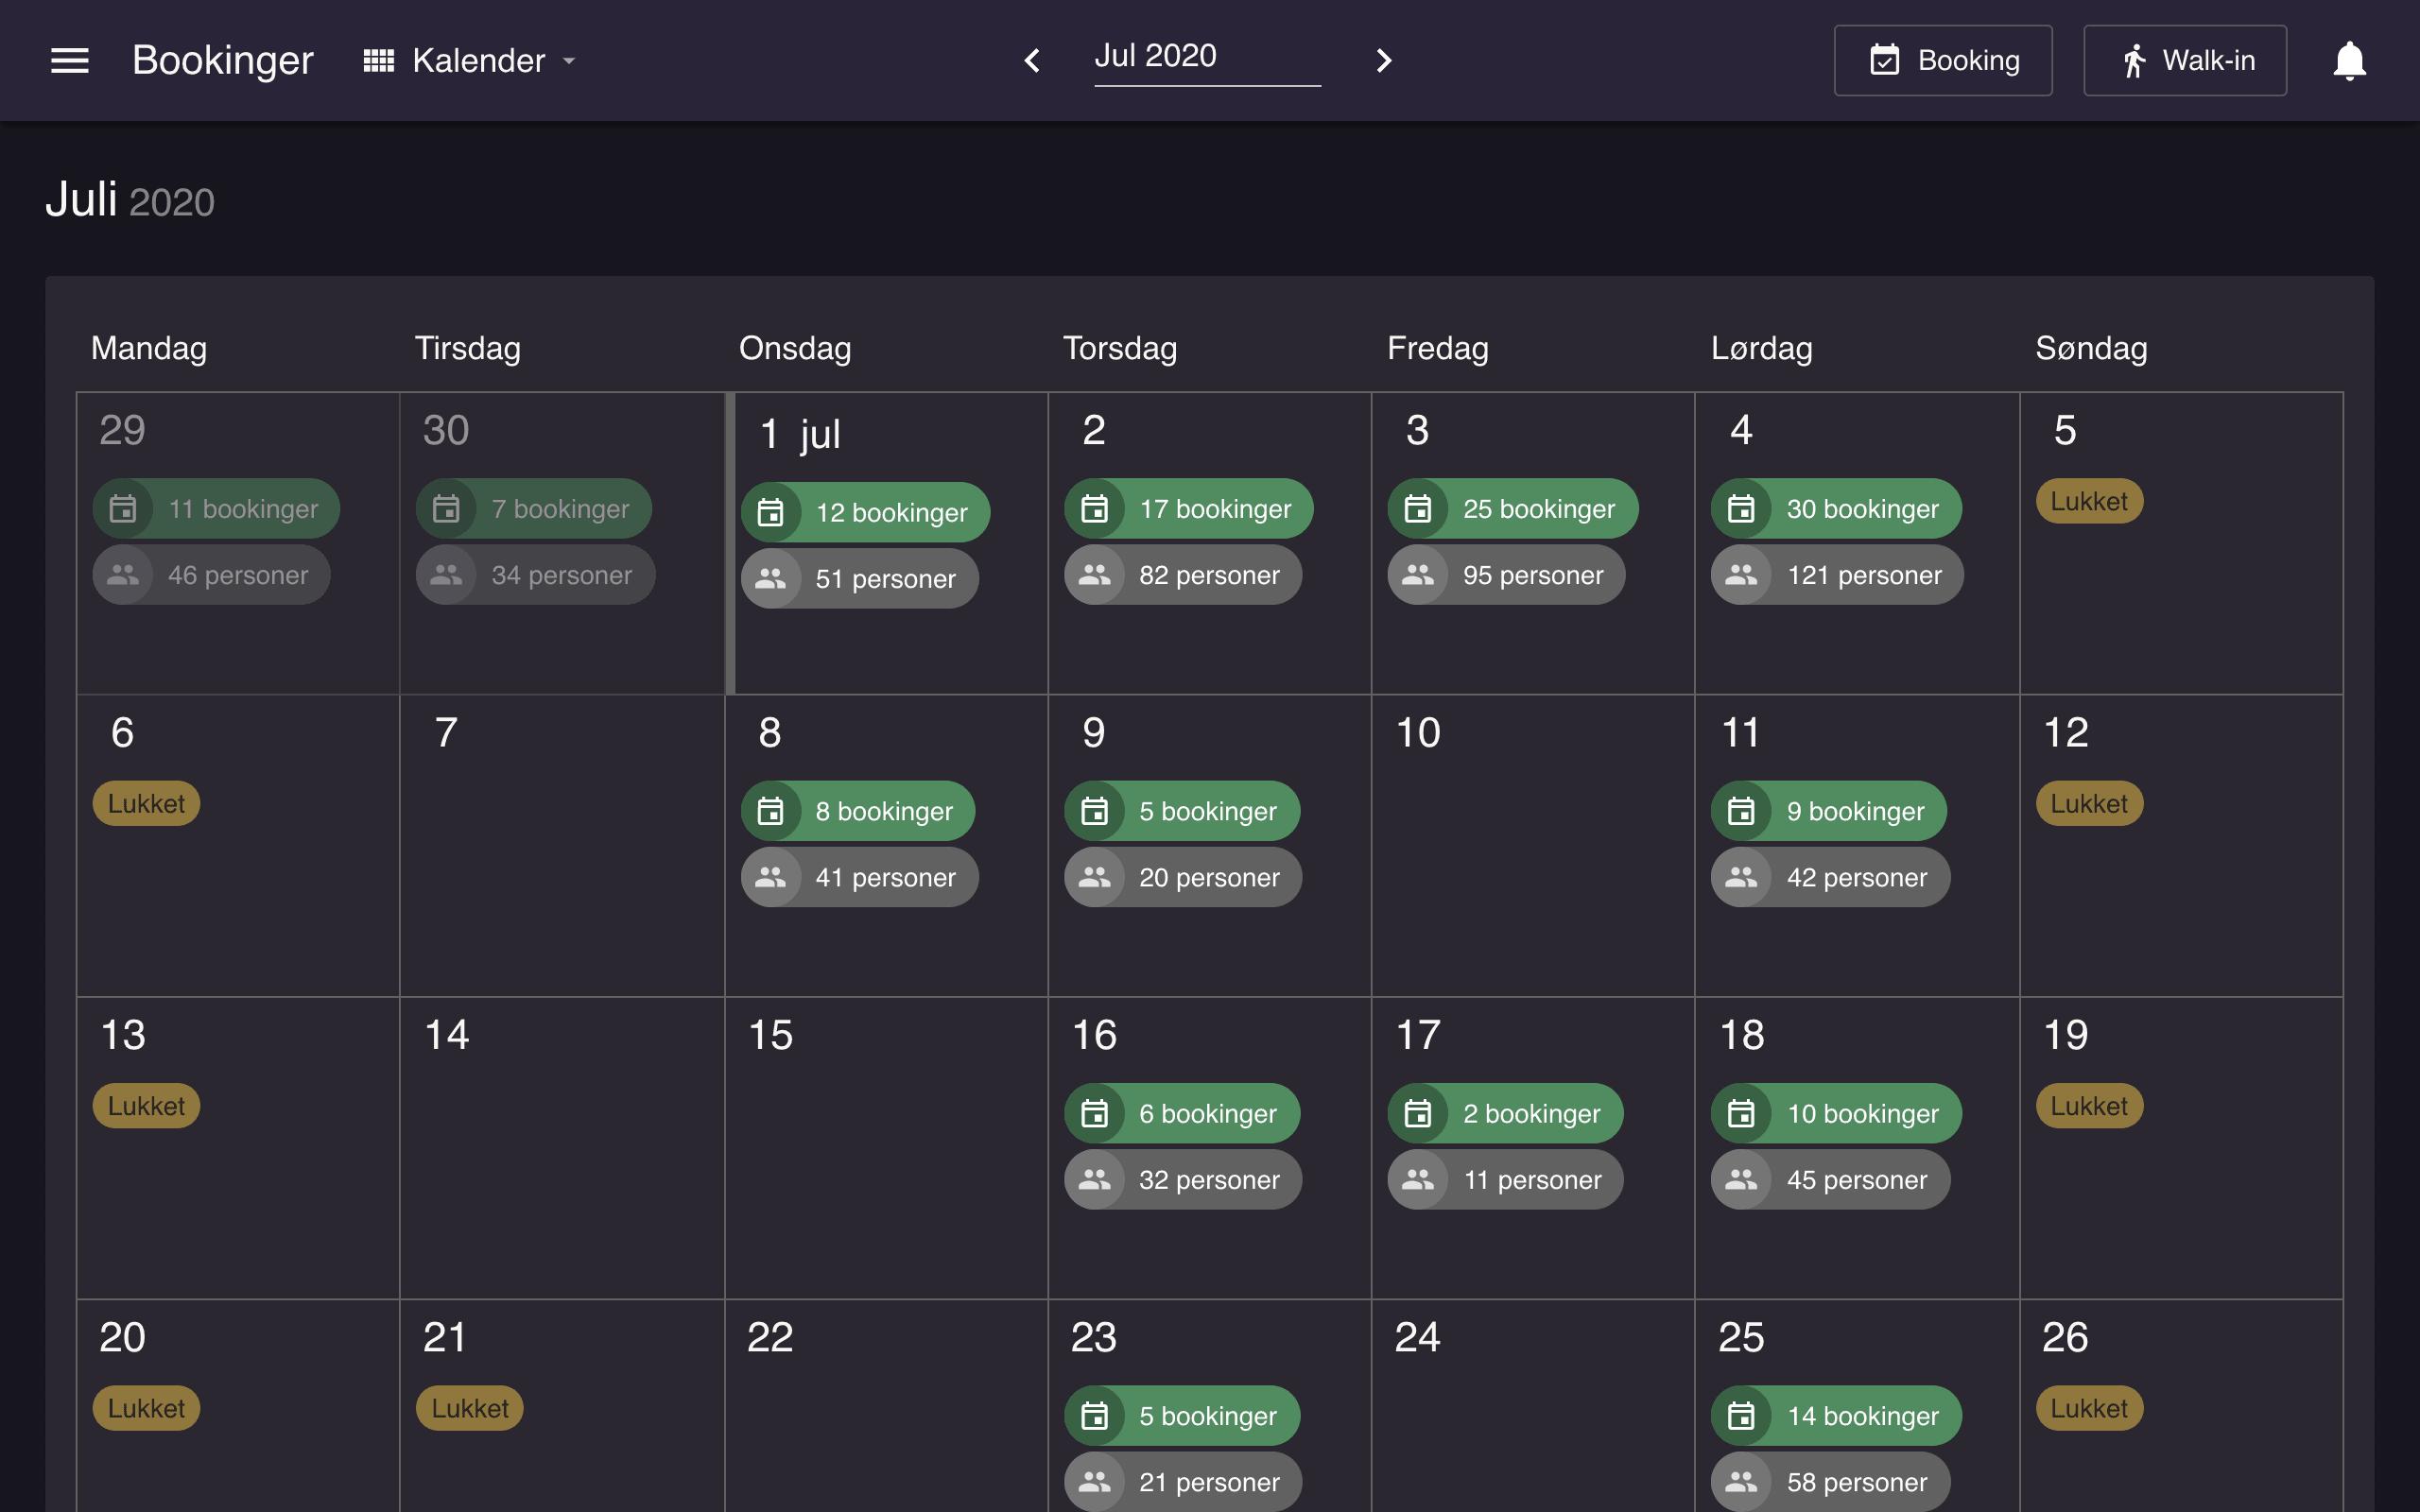 Danish resOS Kalender